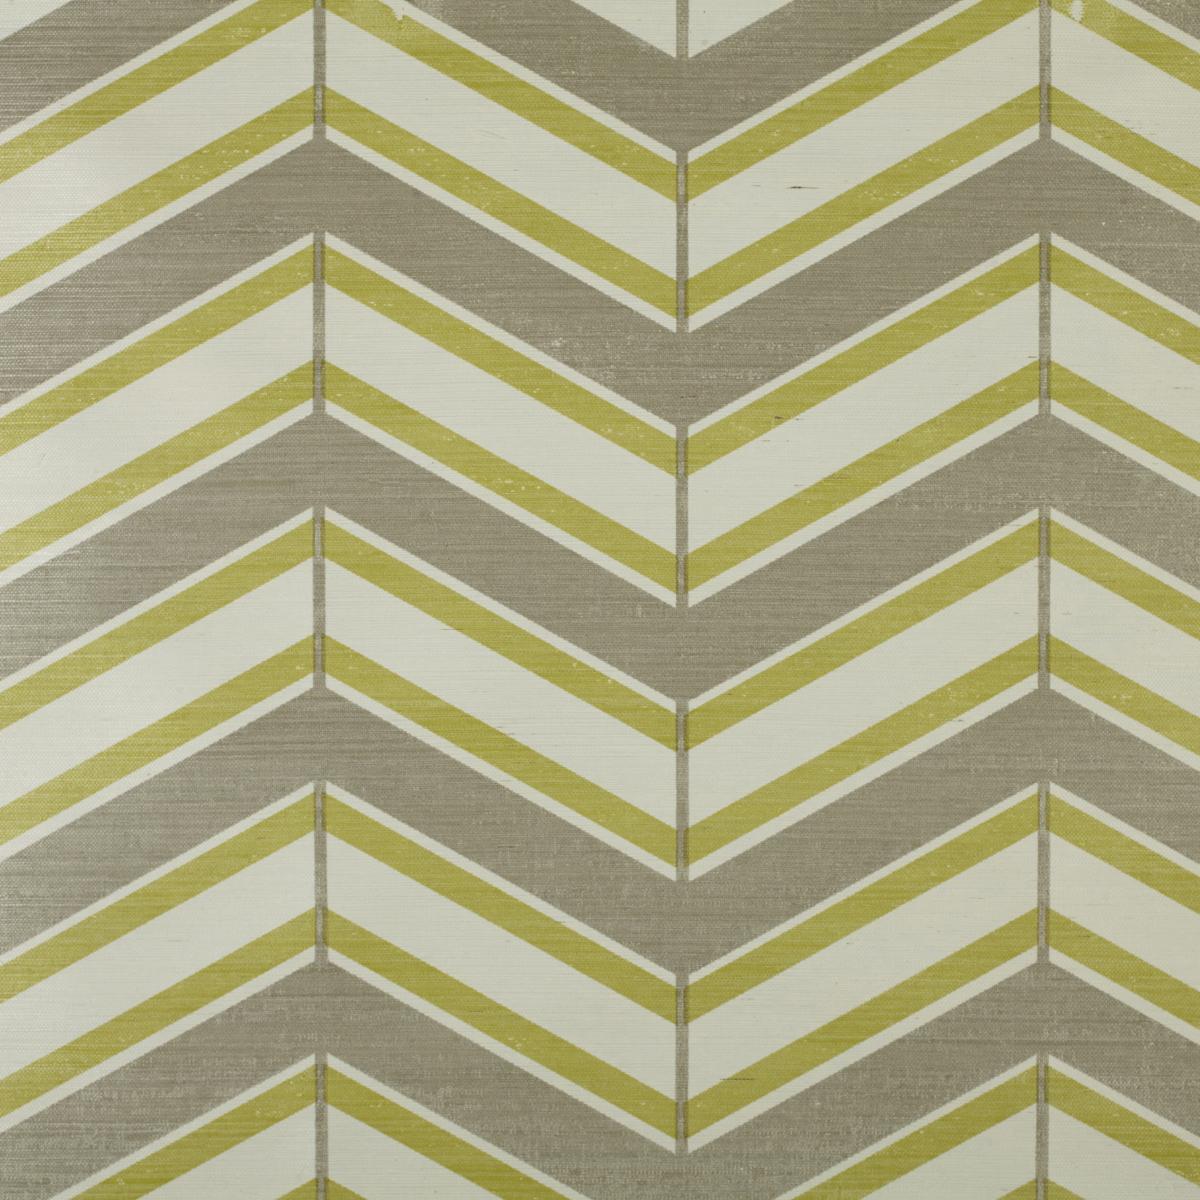 Large Chevron Bernard Thorp Fabric And Wallpaper